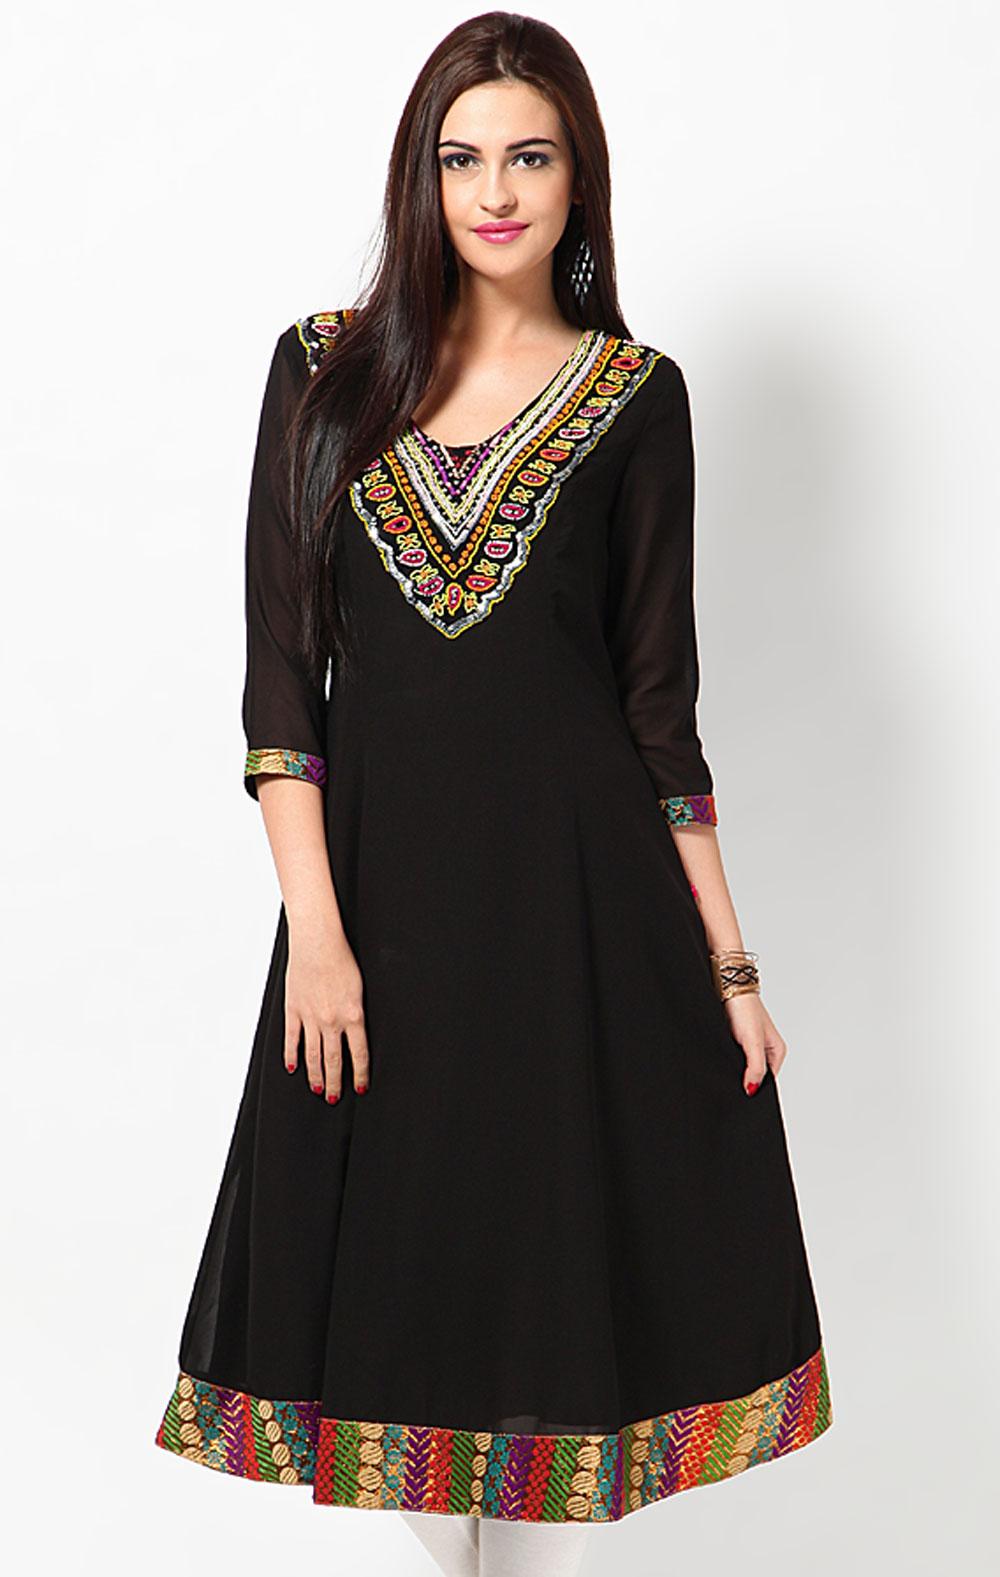 Shirt design kurti - Latest Women Cotton Shirts And Kurti Designs For Spring Summer 11